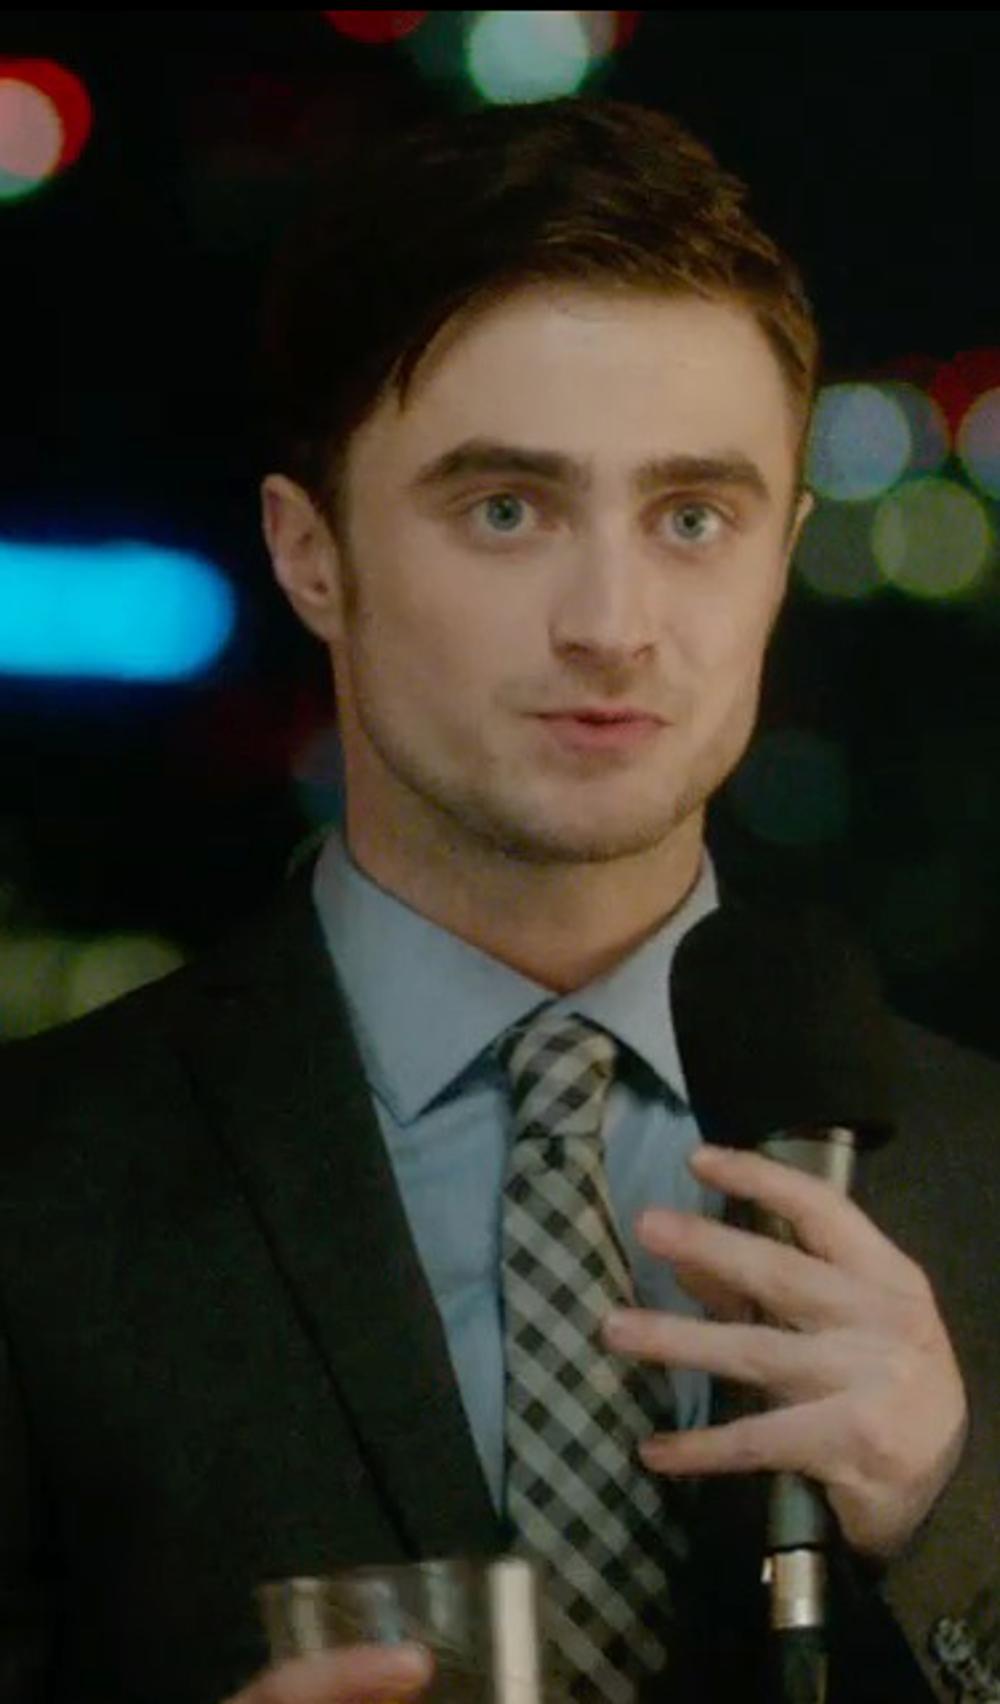 Daniel Radcliffe with Glanshirt Kent Pinstripe Shirt in What If